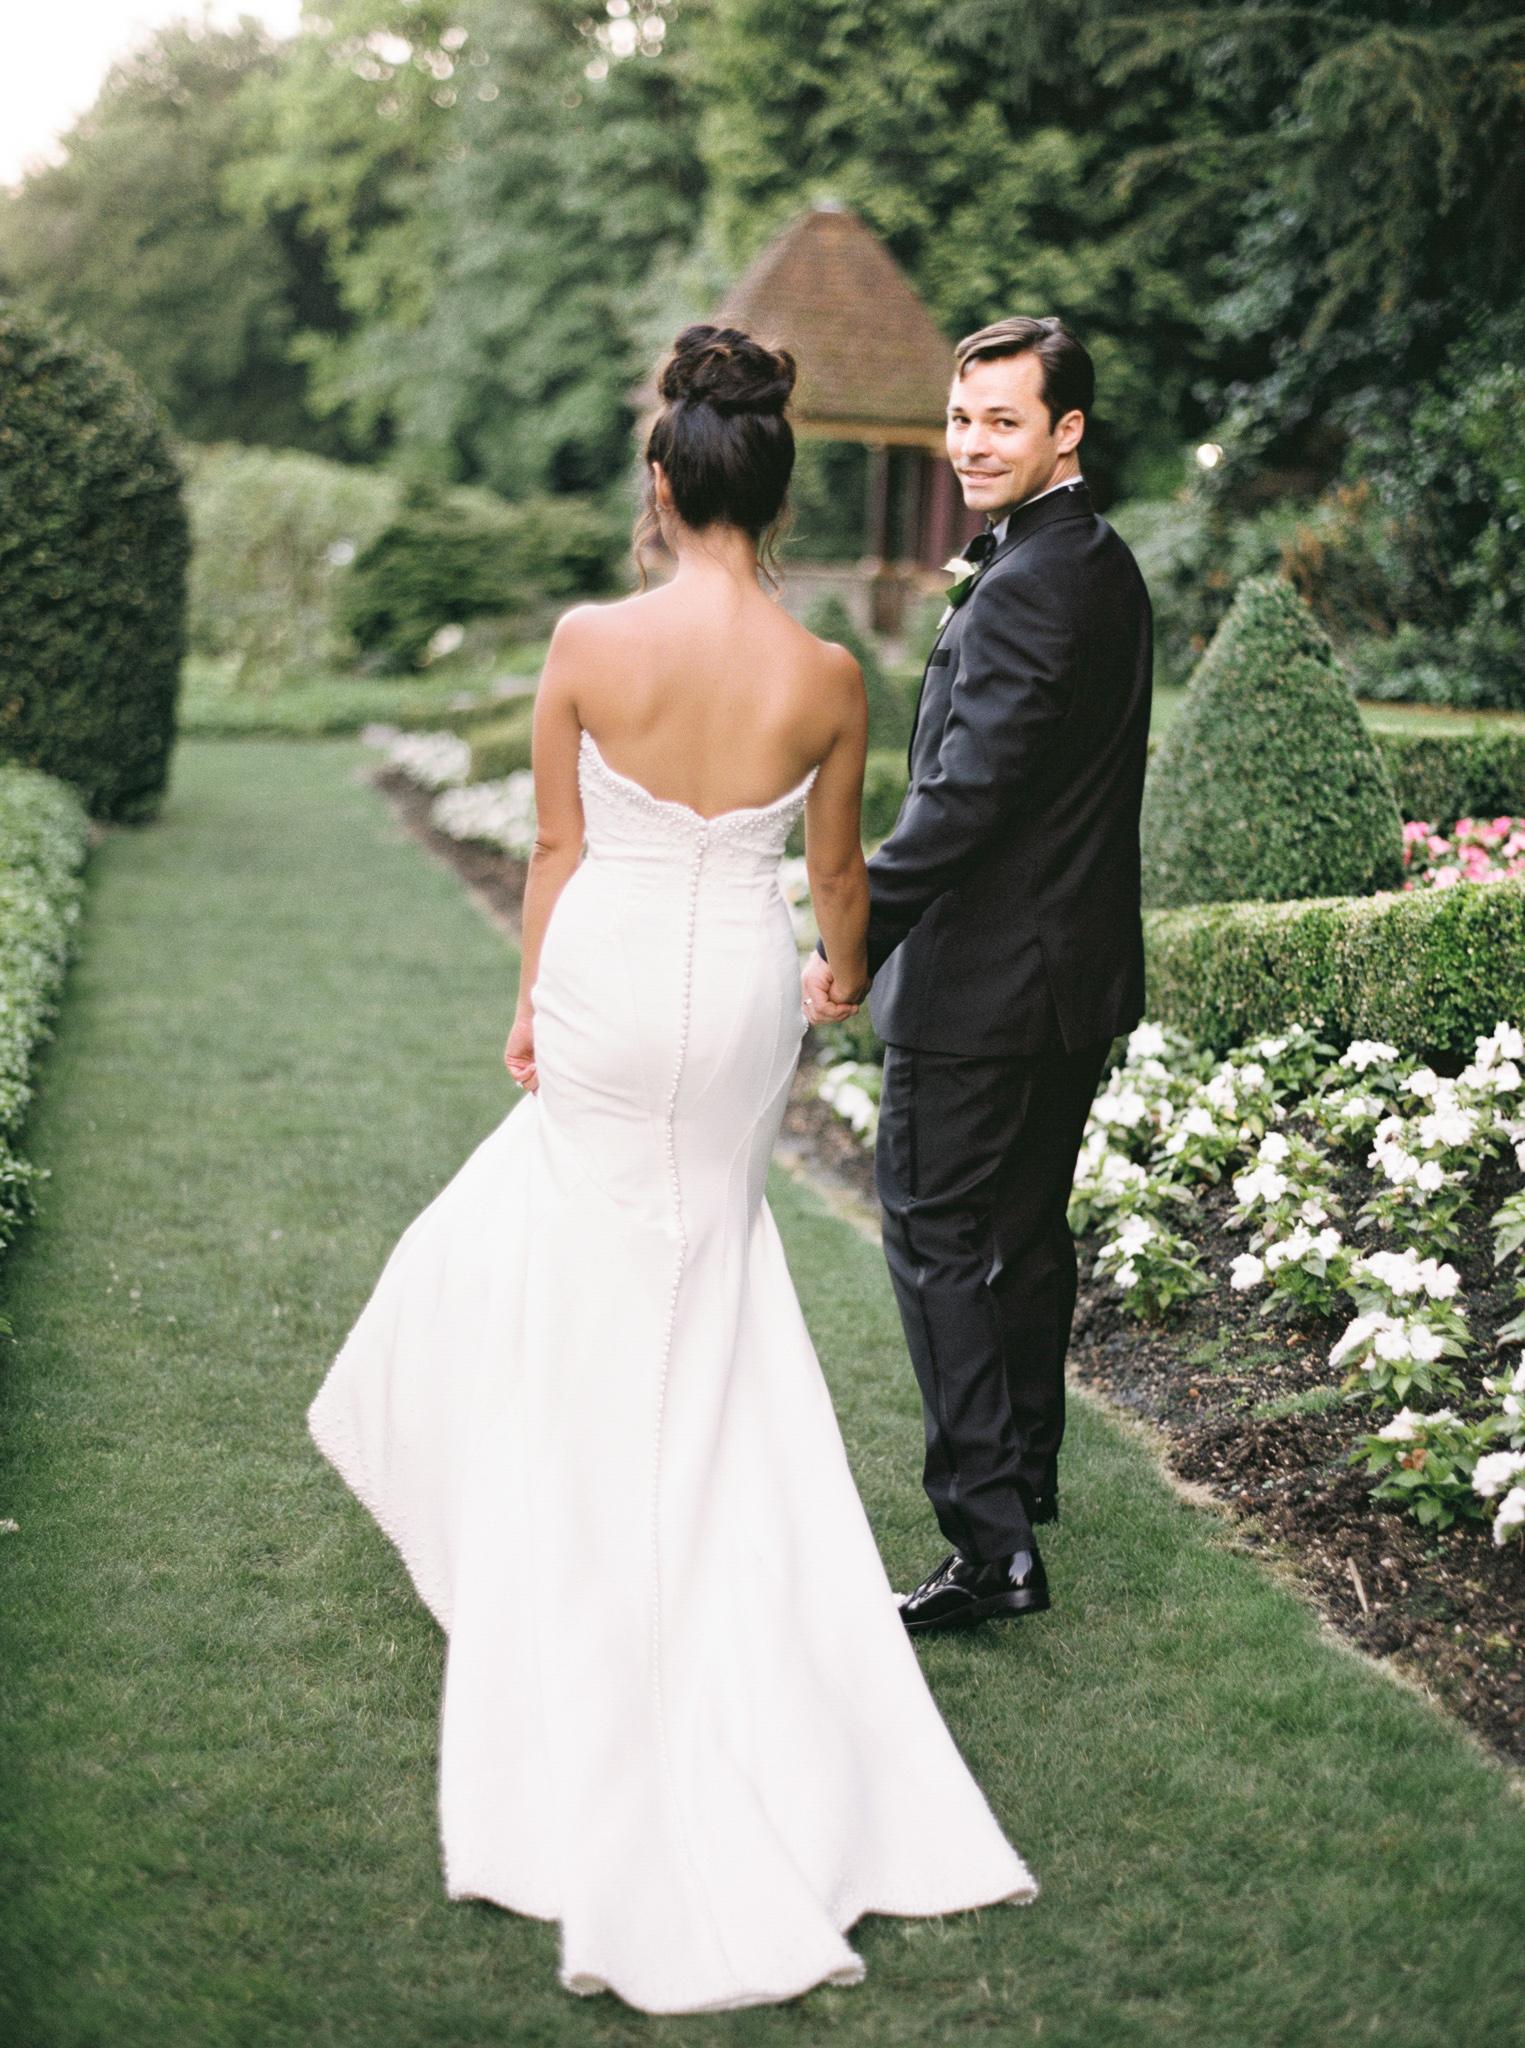 102OutliveCreative_Travel_Photographer_Videographer_Lewis&Clark_Oregon_Elegant_BlackTie_Destination_Wedding.jpg